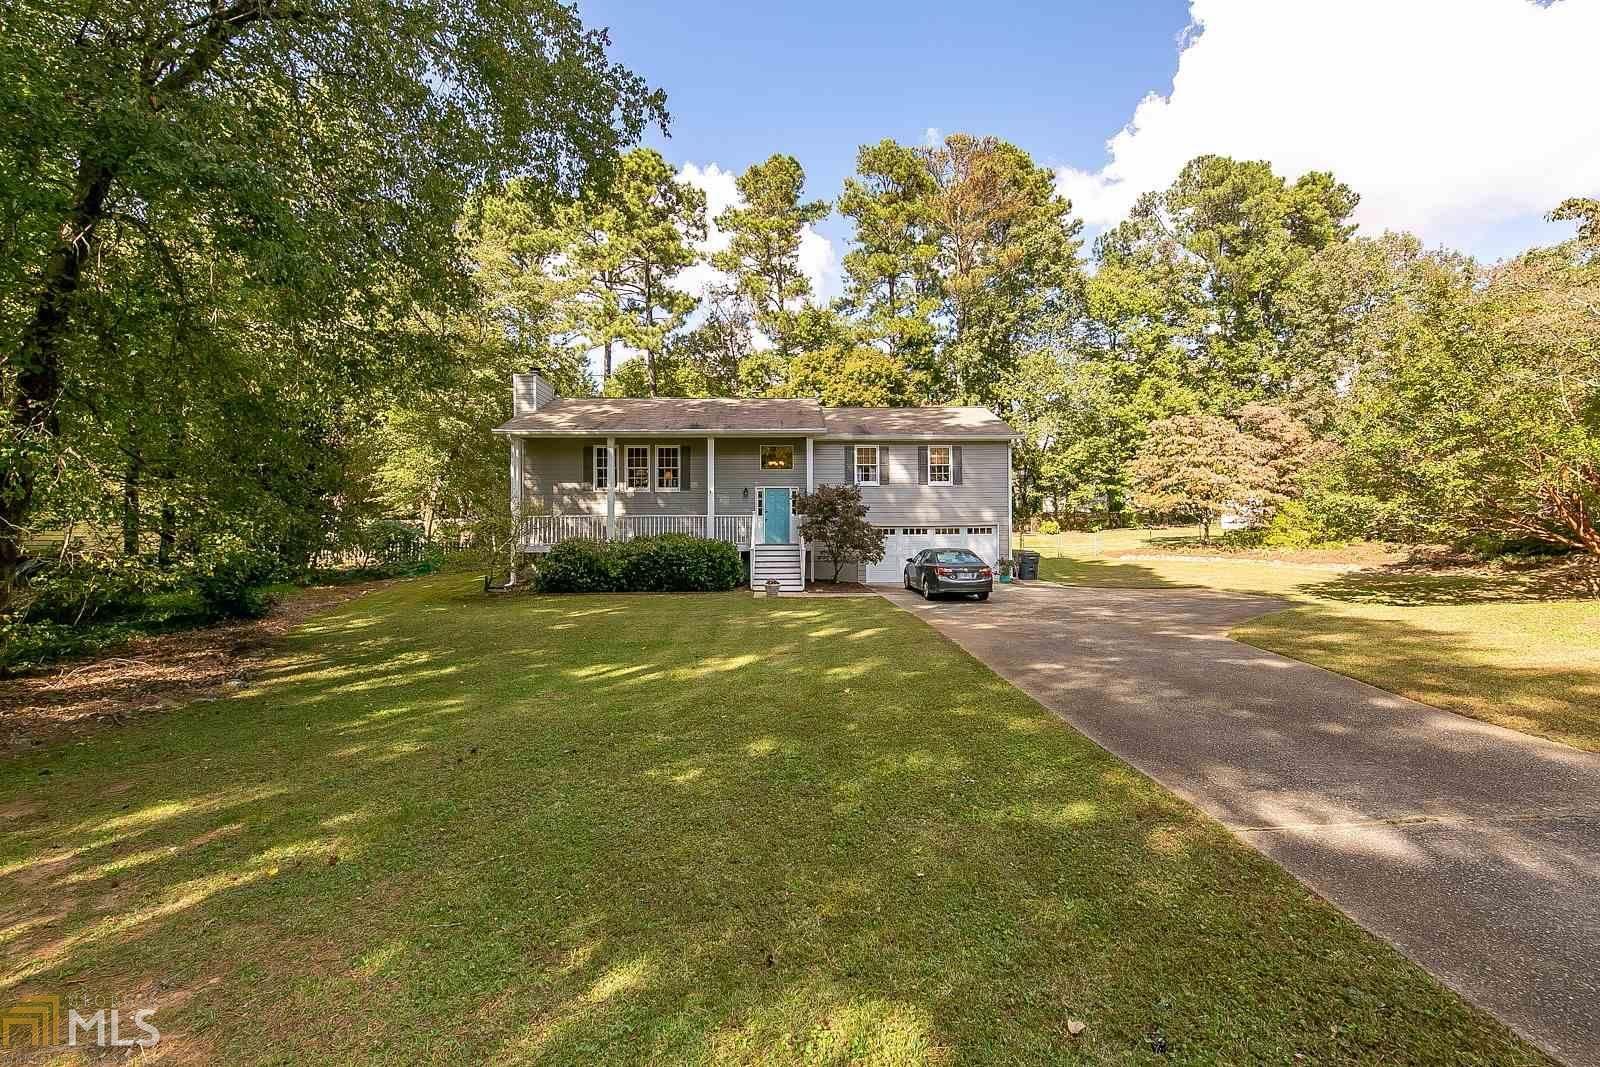 1294 Wood Park, Kennesaw, GA 30152 - MLS#: 8878007